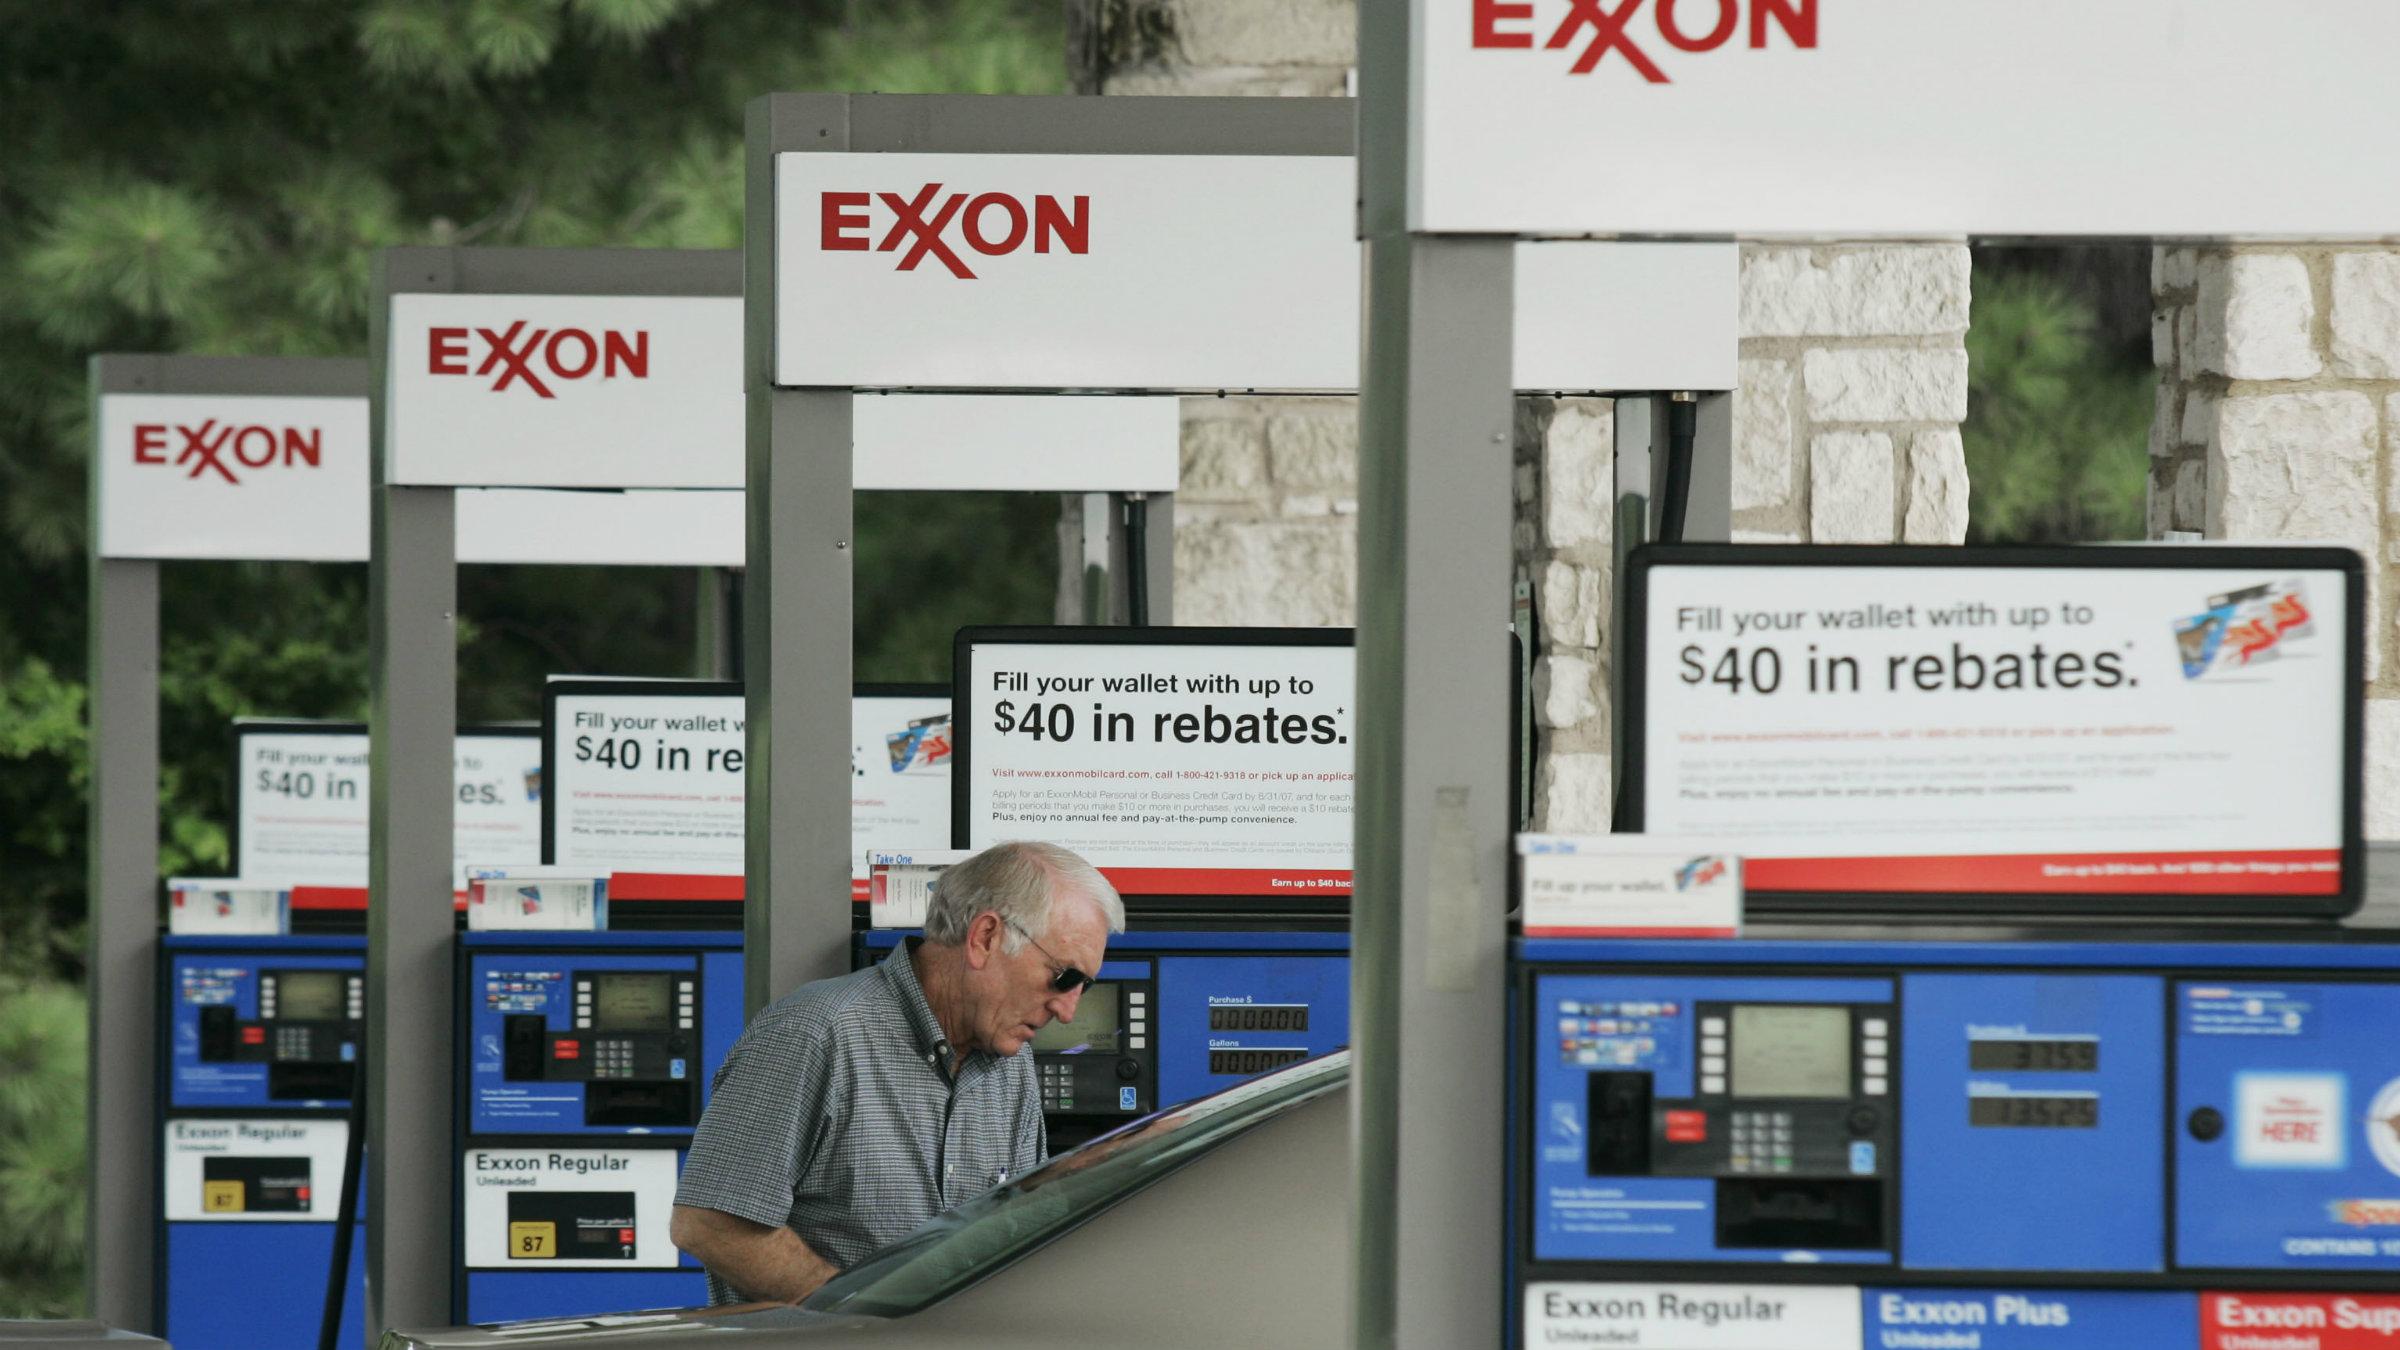 ExxonMobil gas station